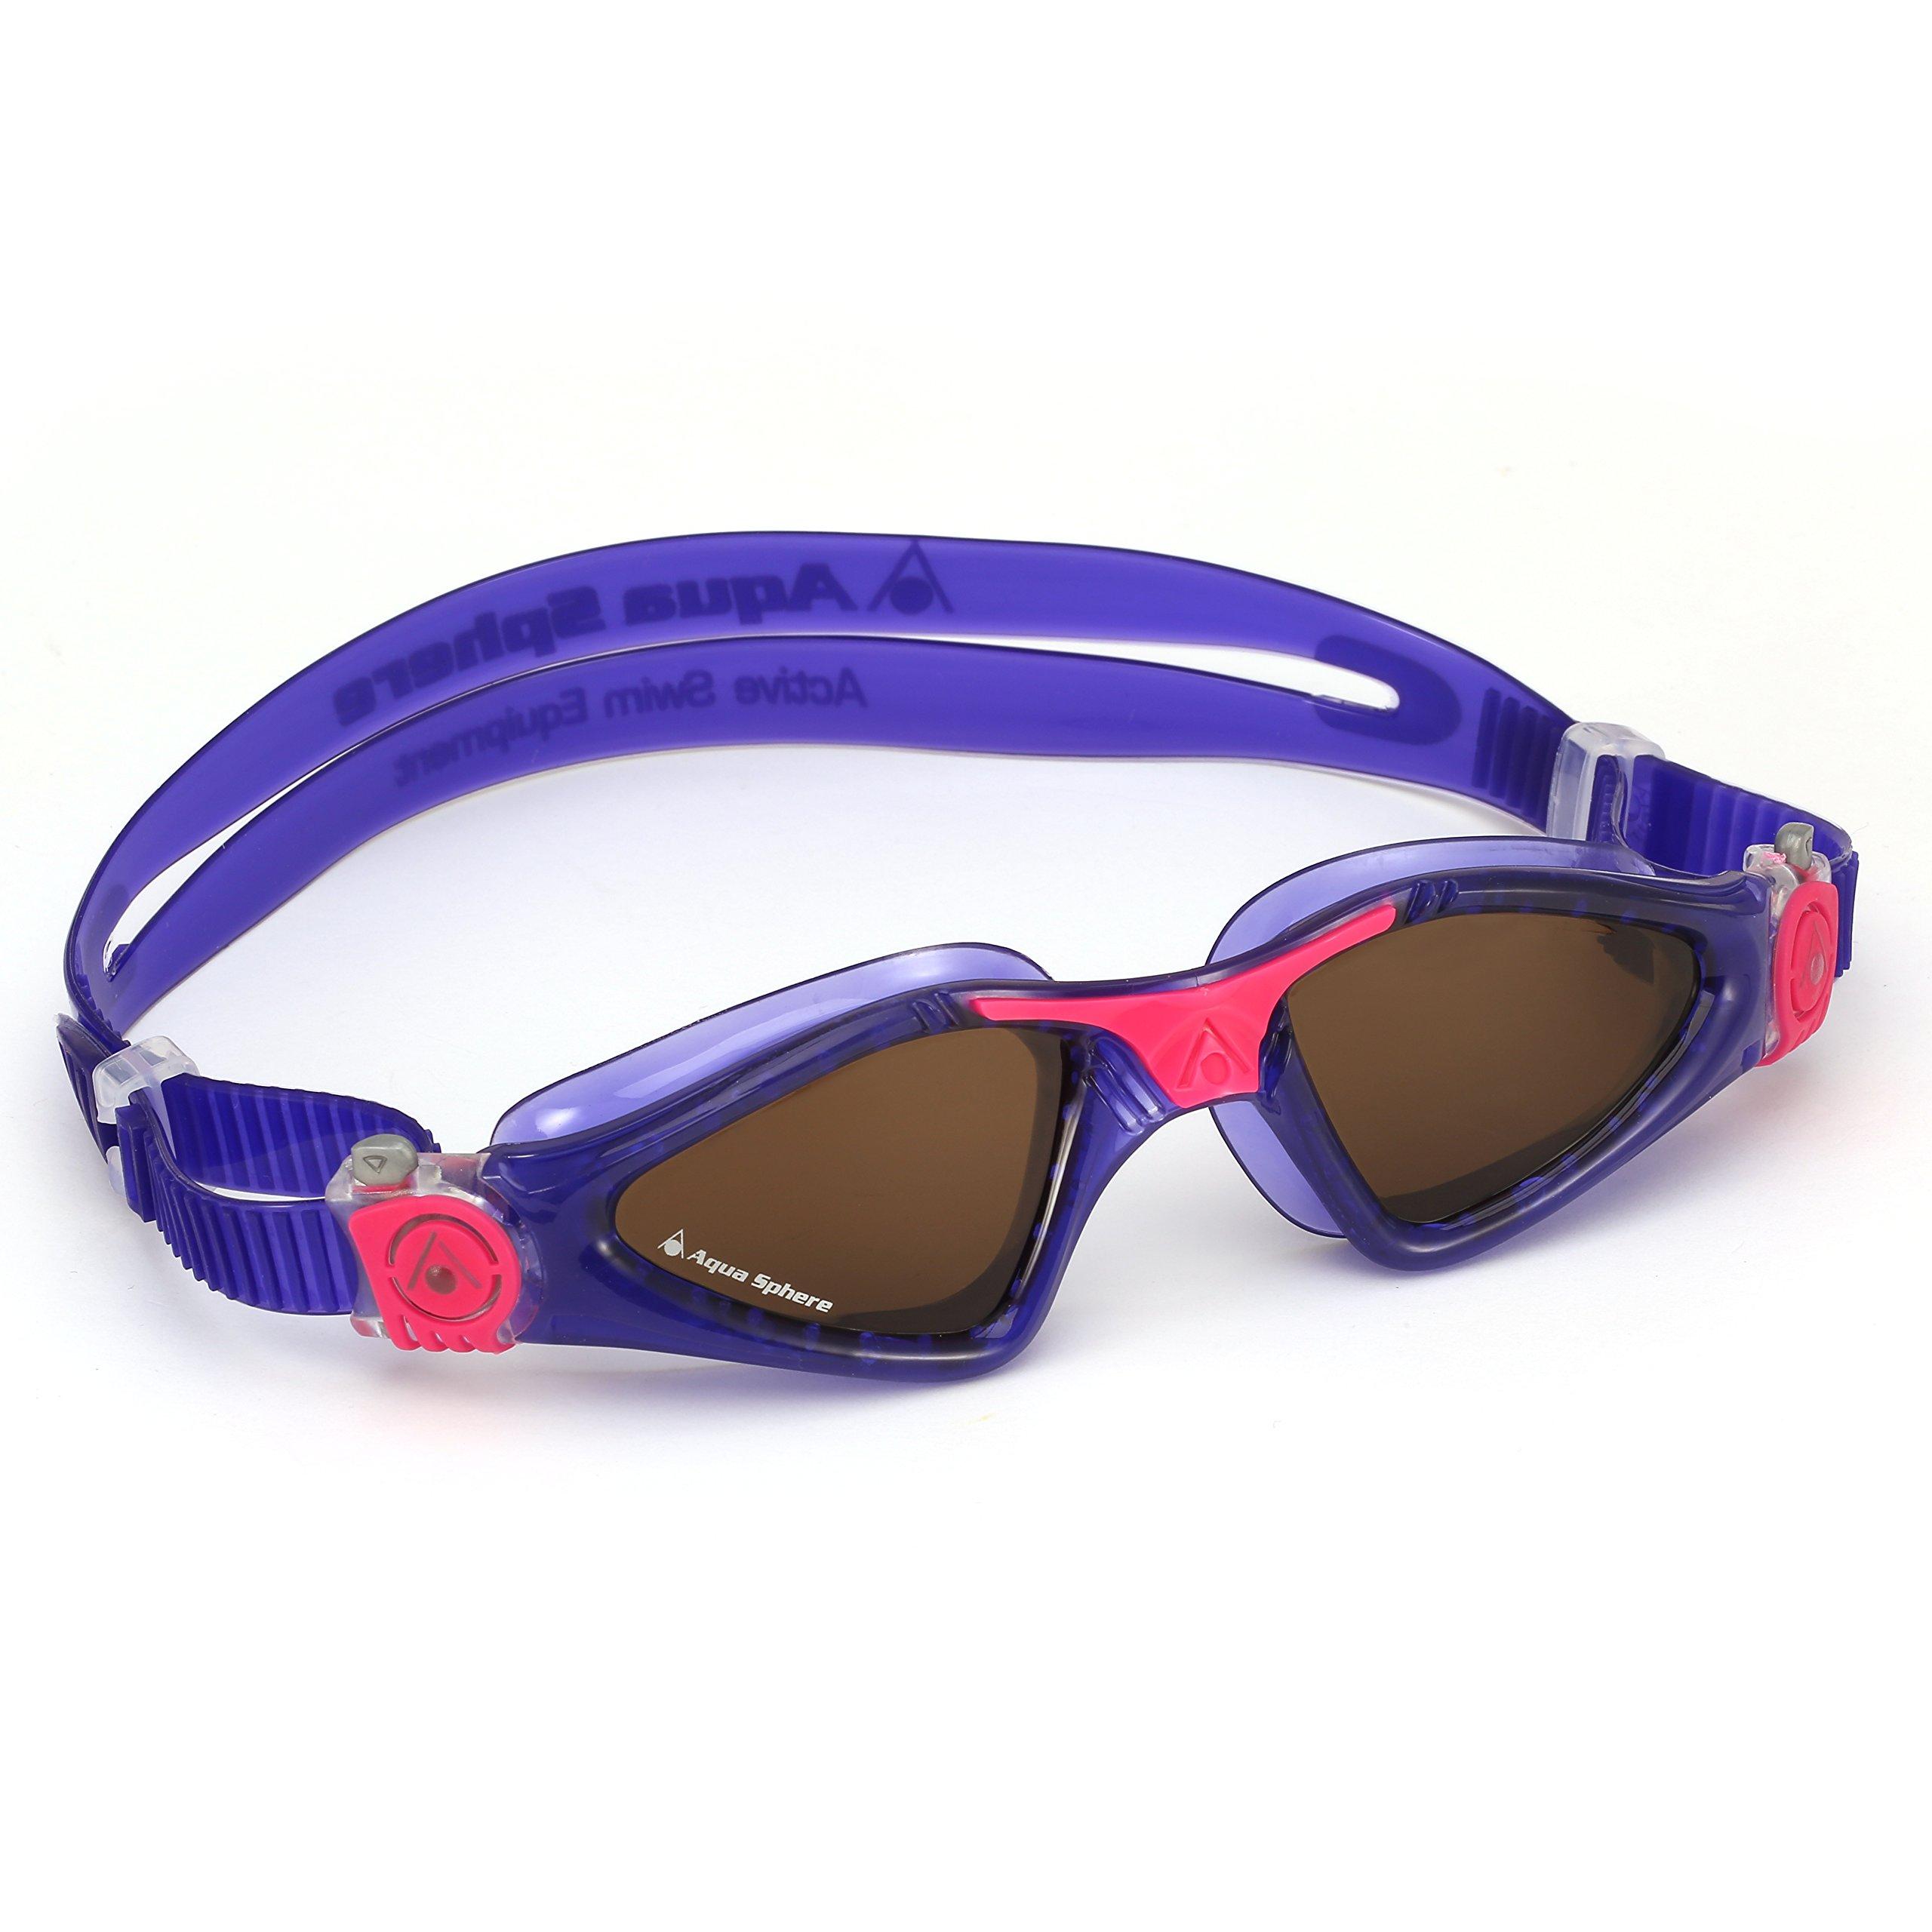 Aqua Sphere Kayenne Ladies Swimming Goggles Polarized Lens, Violet & Pink UV Protection Anto Fog Swim Goggles for Women